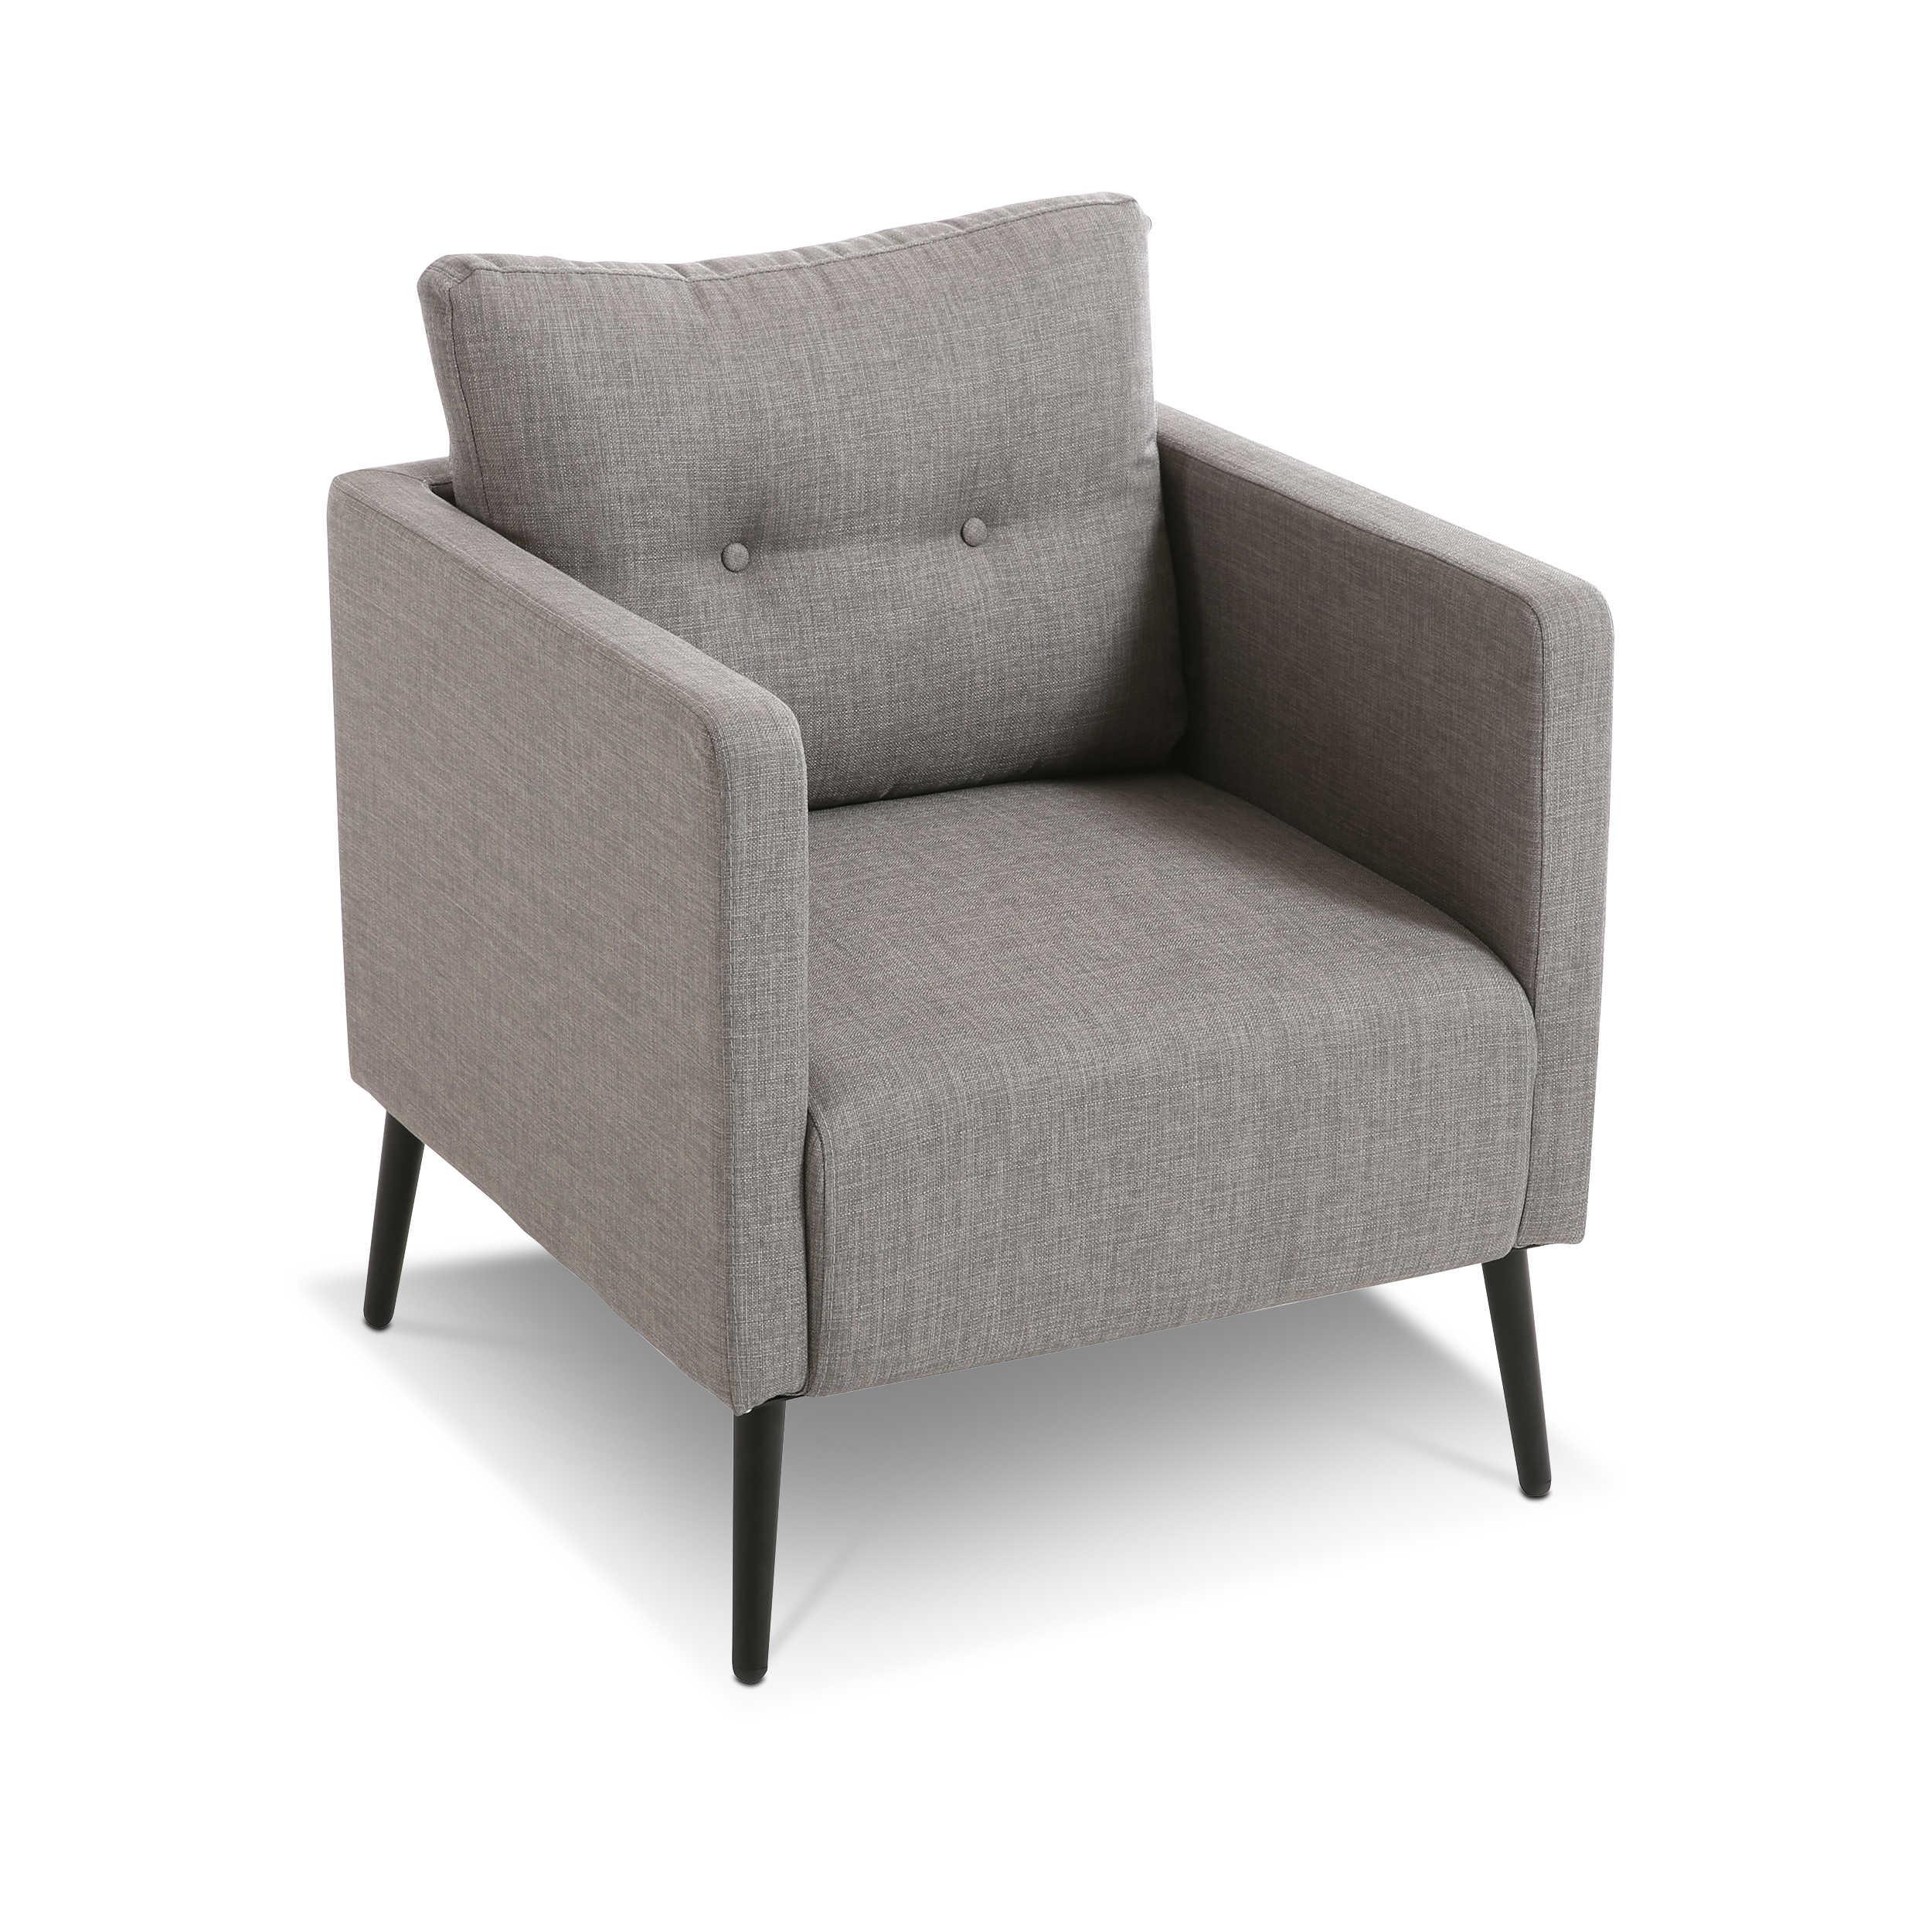 sessel lugano grau stoff online kaufen bei woonio. Black Bedroom Furniture Sets. Home Design Ideas